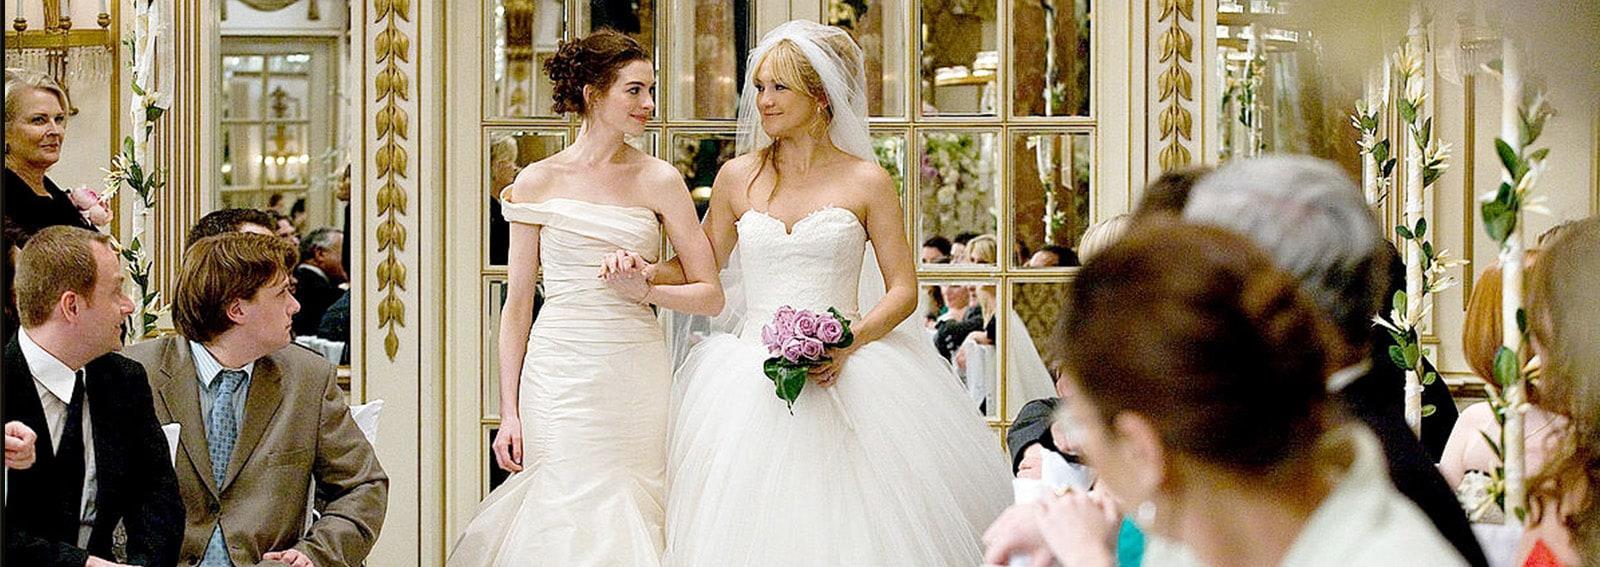 Anne Hathaway sposa